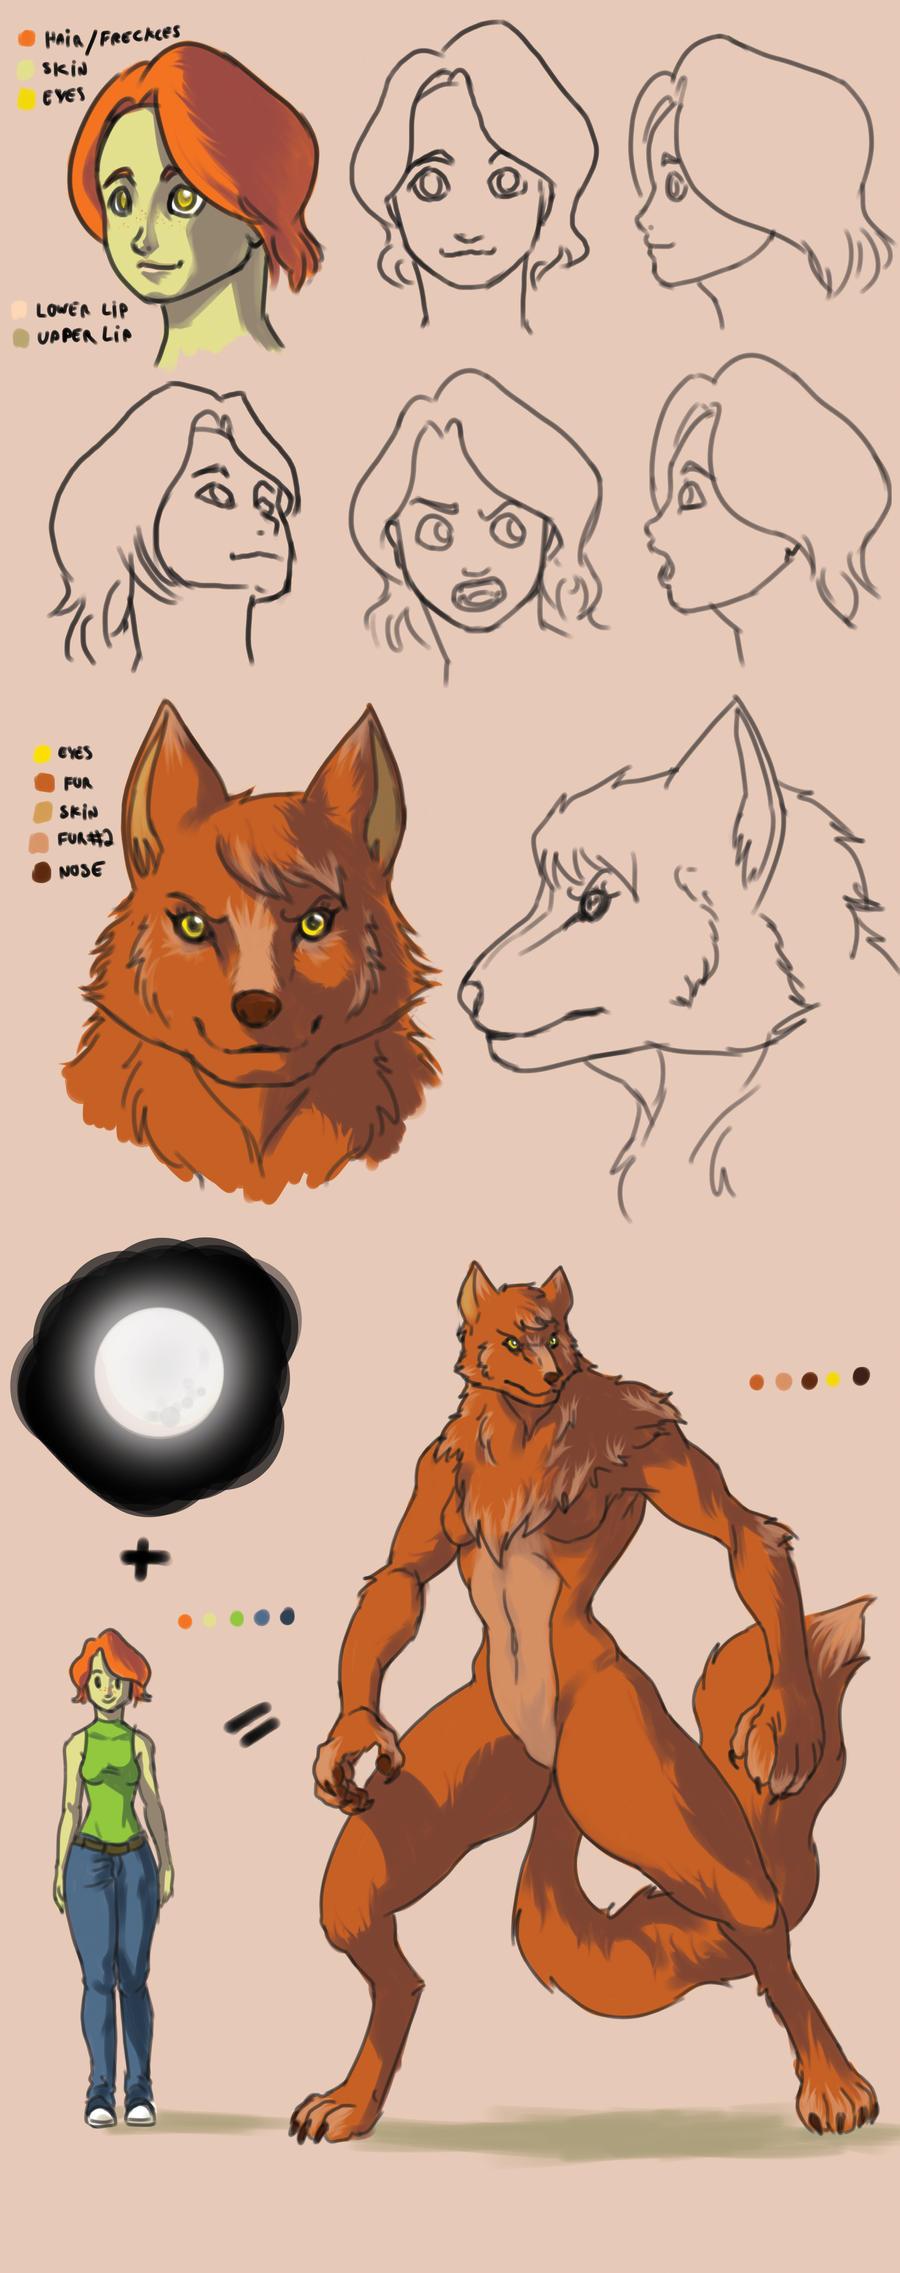 werewolf girl by davi-escorsin